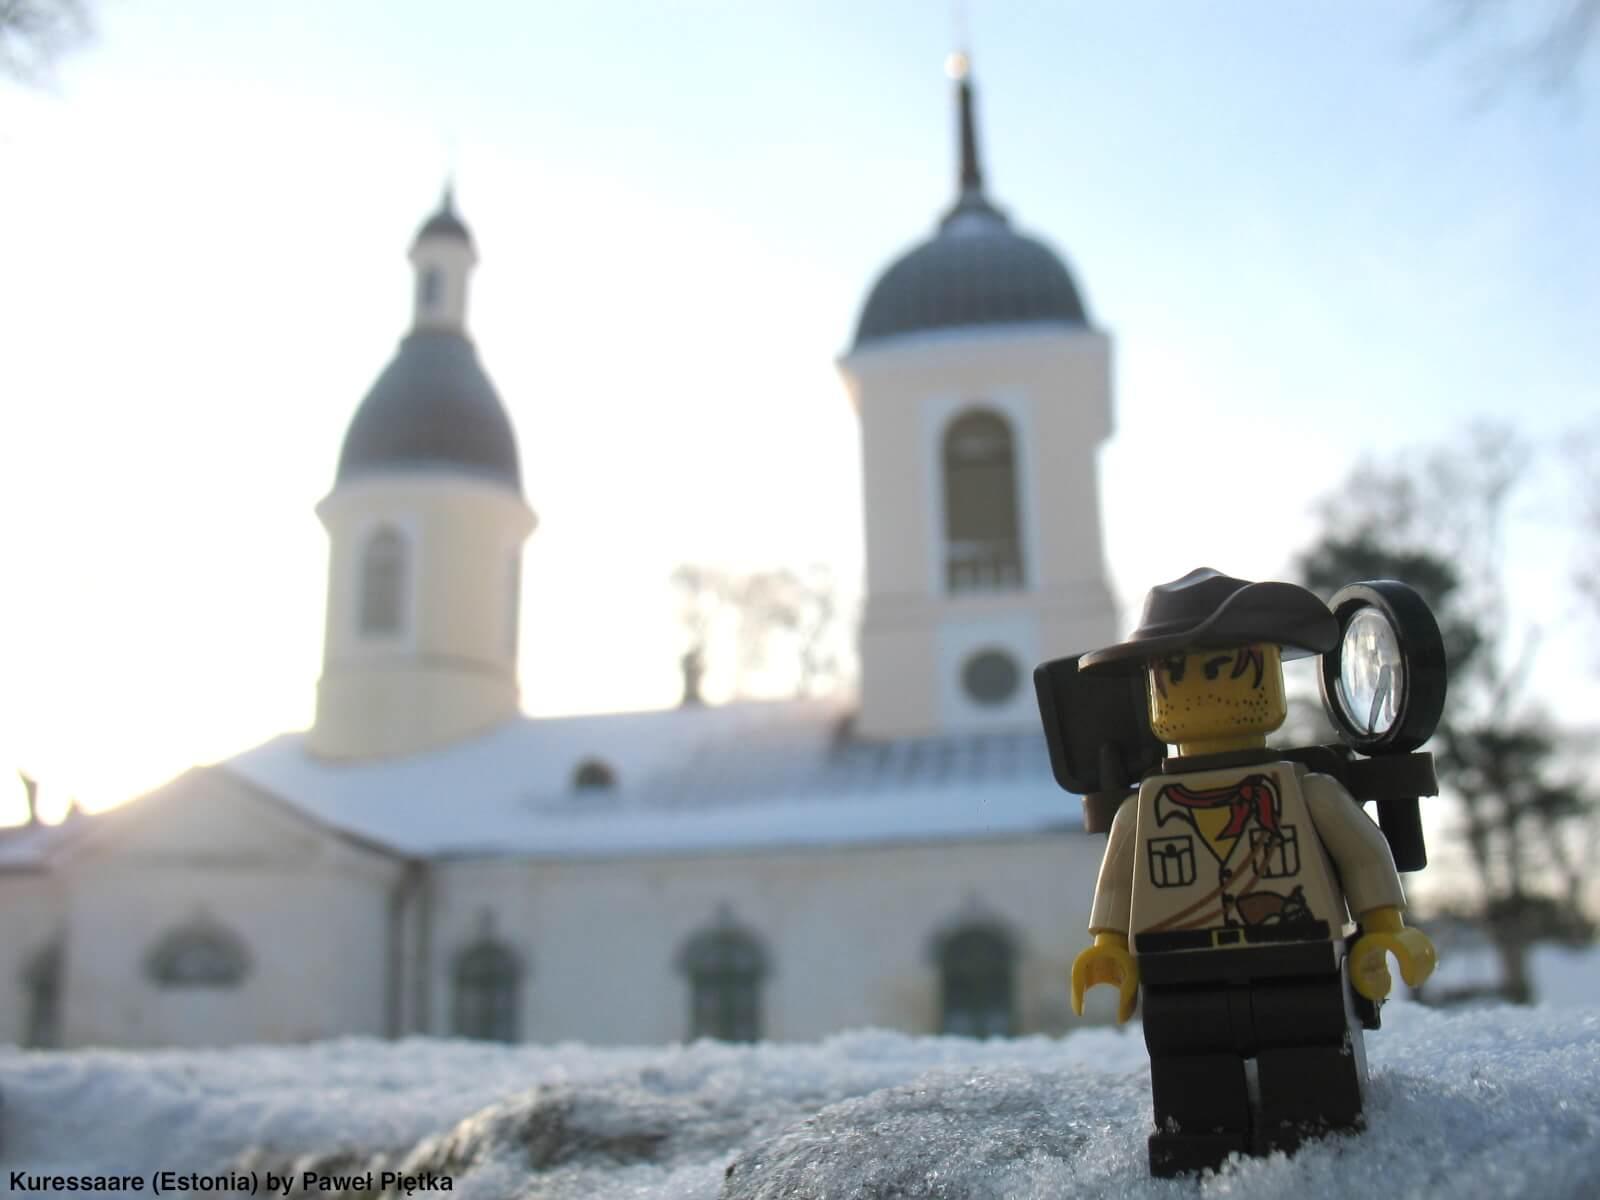 Kuressaare (Estonia) - St Nicholas Church